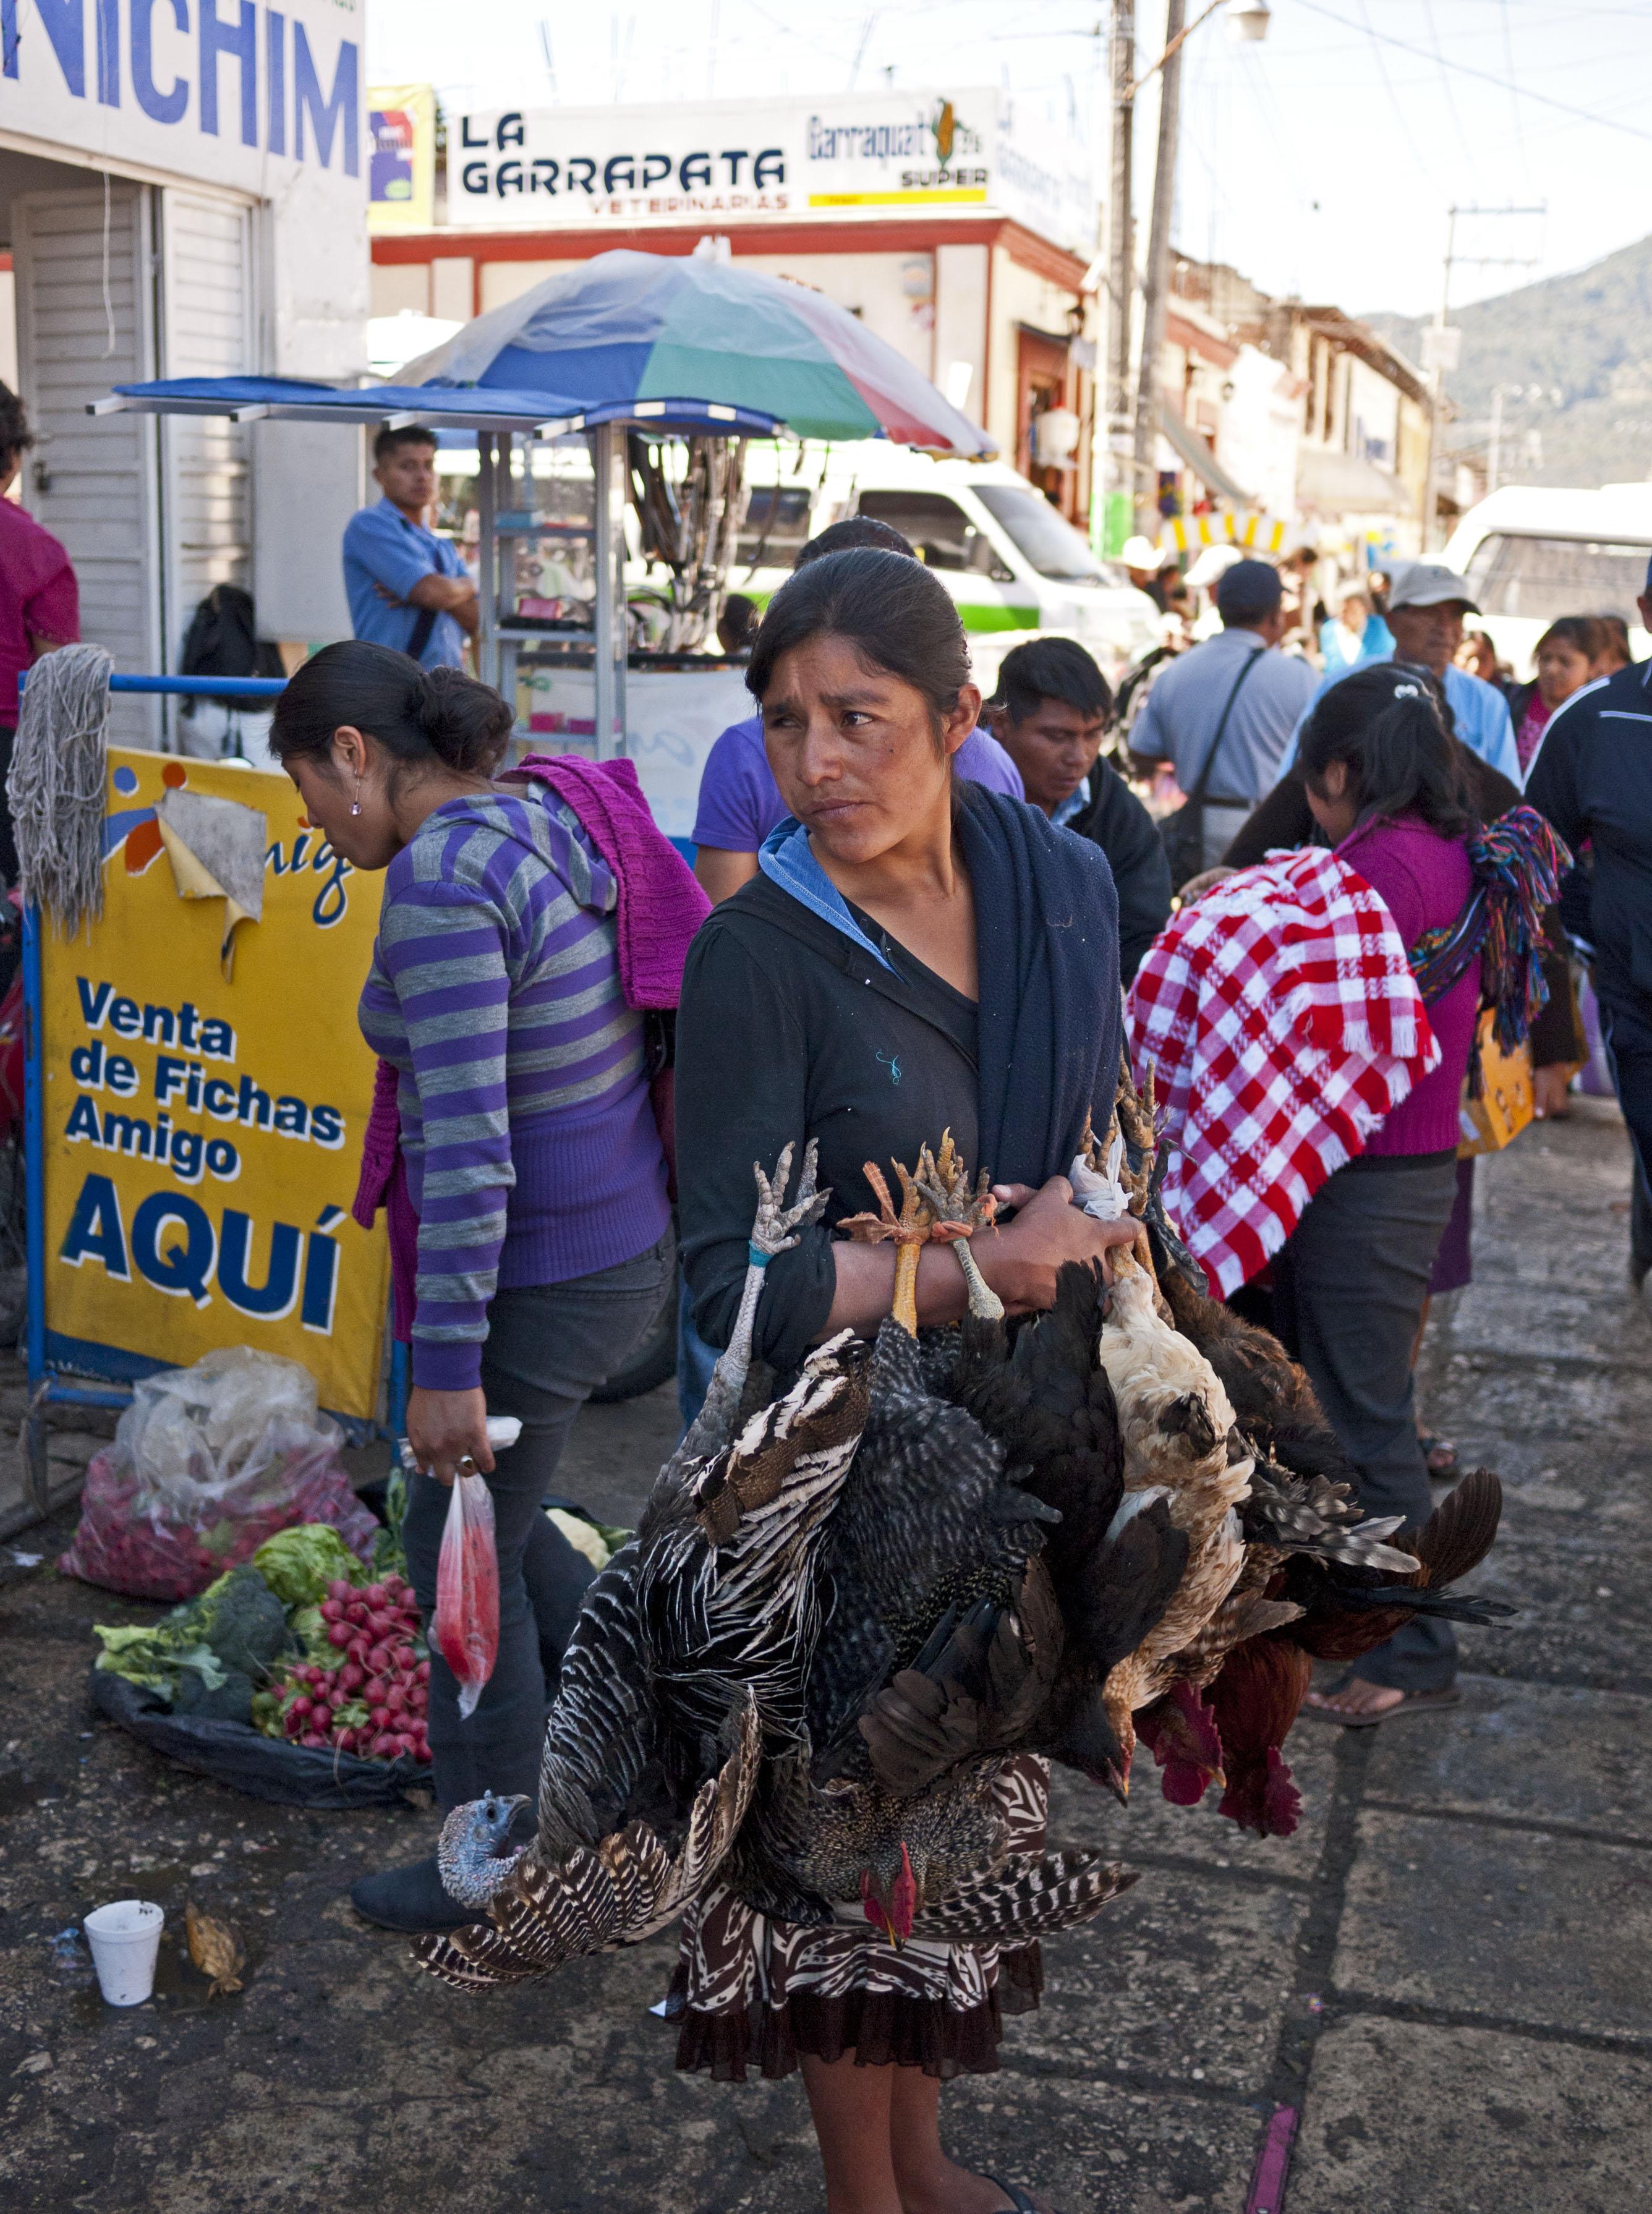 san cristobal de las casas single jewish girls Global wanderer stephanie elizondo griest goes native in mexican enough by o lani, san  it is the same single-minded  29240 san cristóbal de las casas.